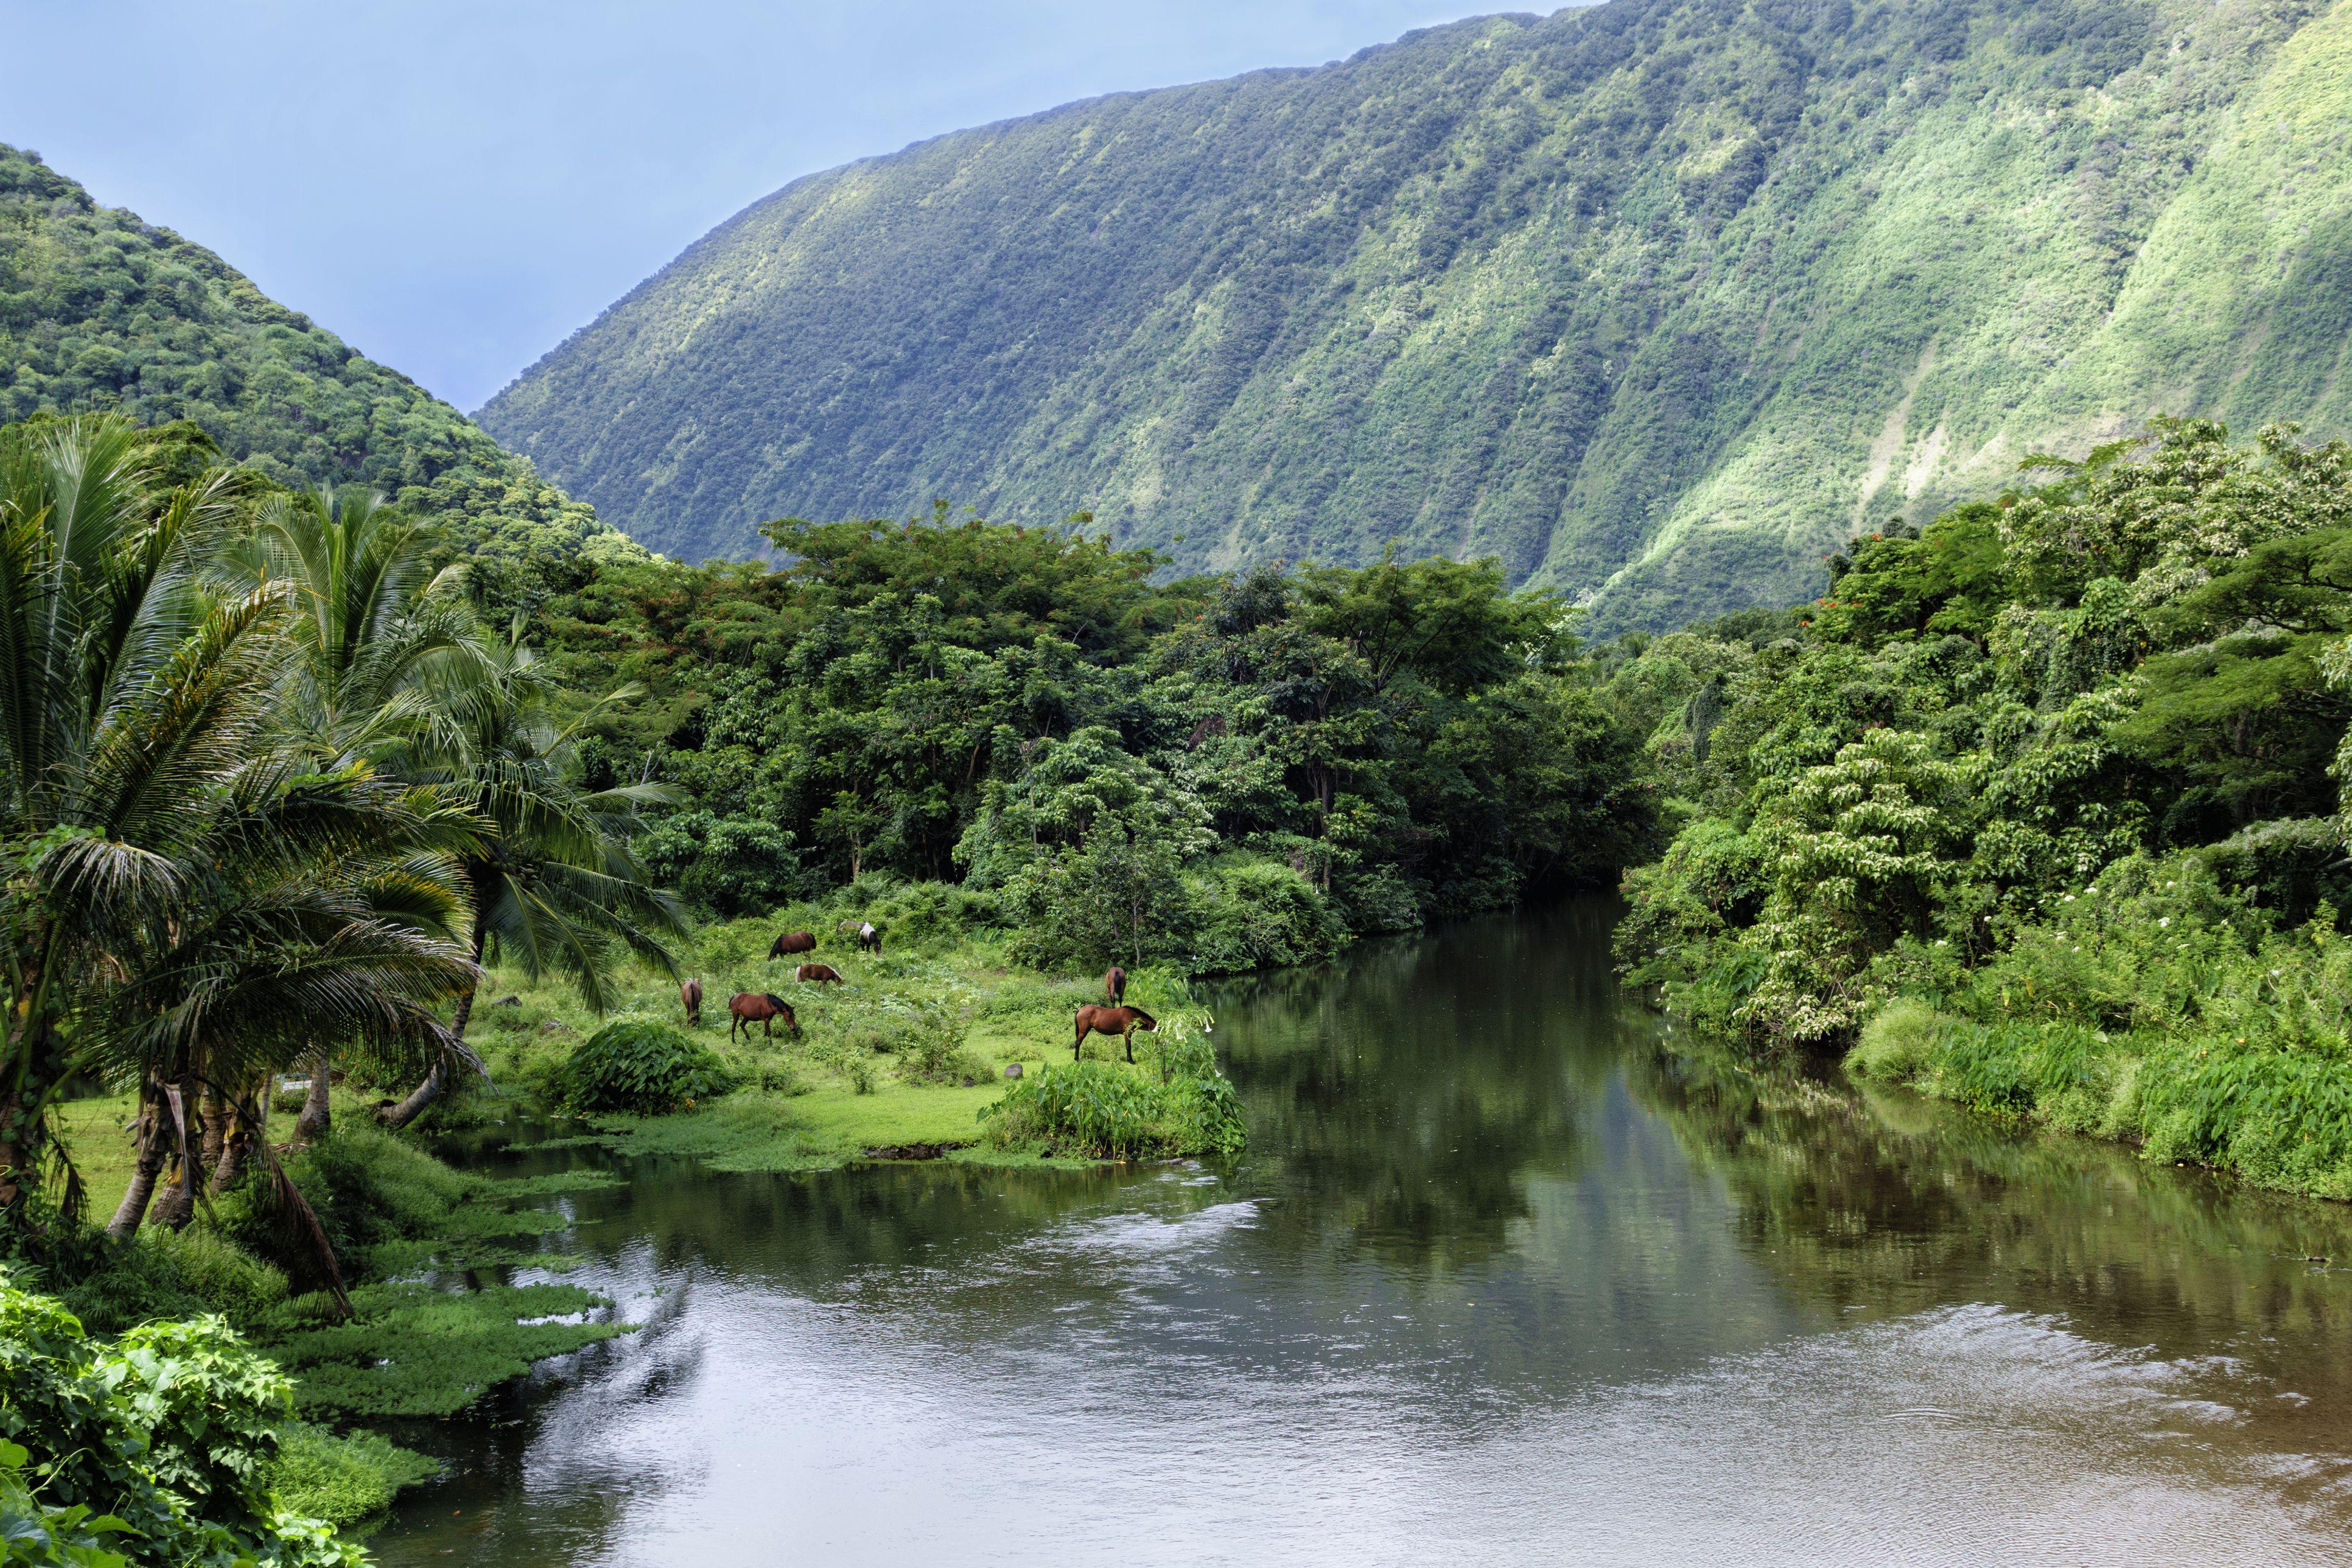 Wild horses on banks of Waipio Valley River